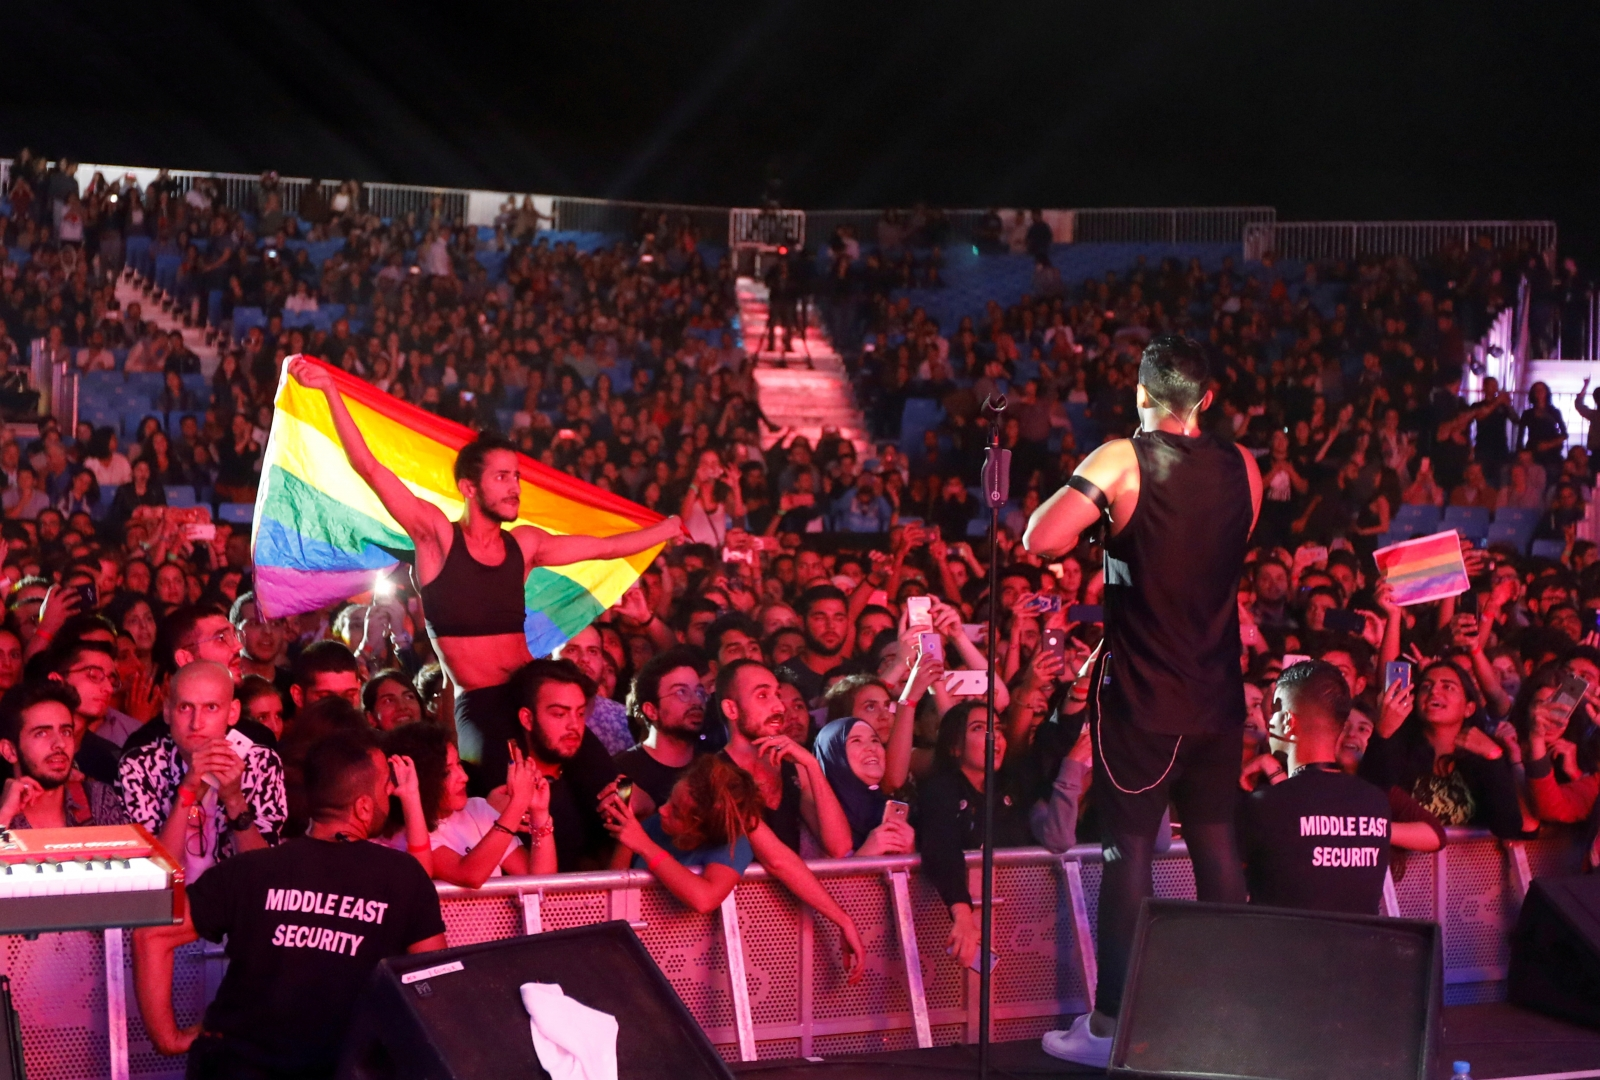 lebanese-band-mashrou-leila-take-final-bow-at-controversial-cairo-concert